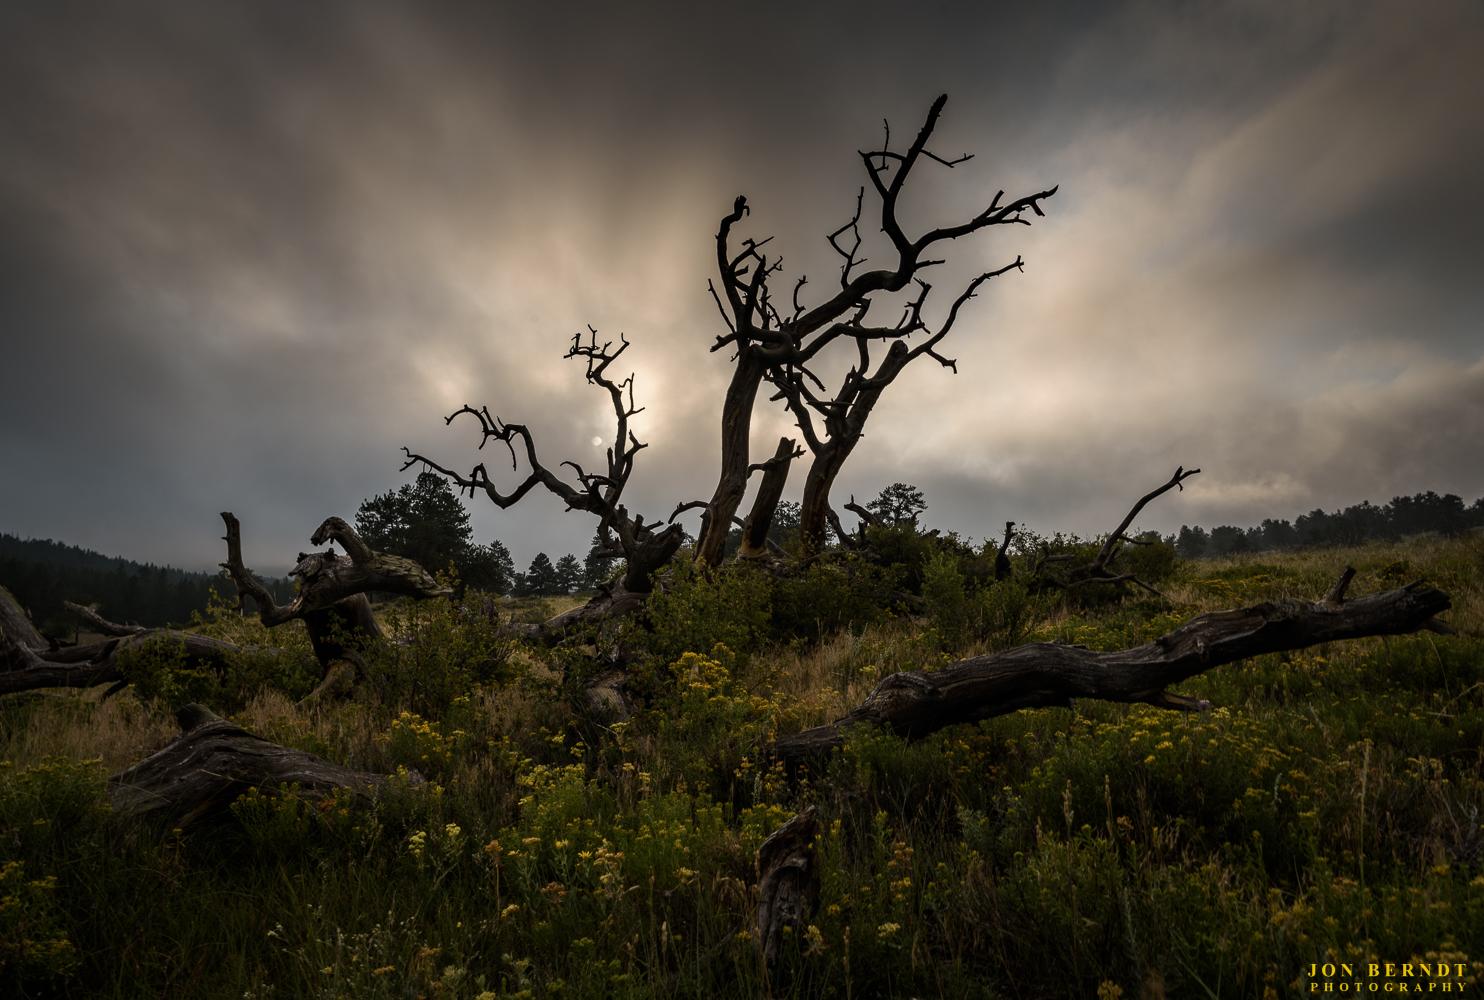 Spooky scene under a blanket of fog in RockyMountain National Park.(C) 2017 Jon Berndt Photography